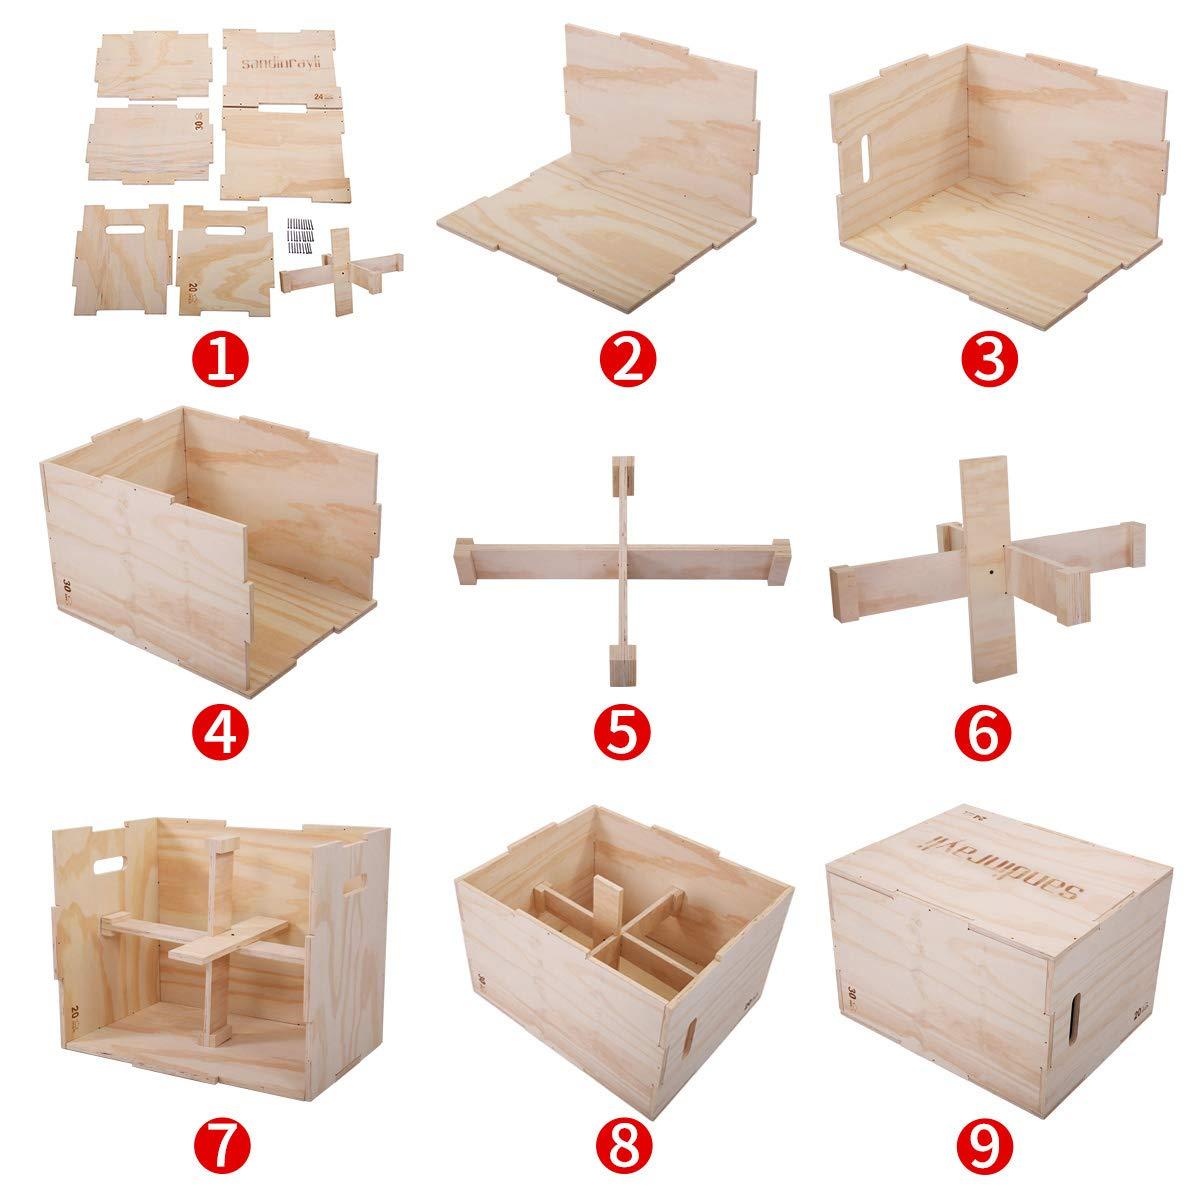 LAZYMOON 3 in 1 Wooden Plyo Box 20x24x30 Inch Crossfit Plyometrics Box Platform Jump Training